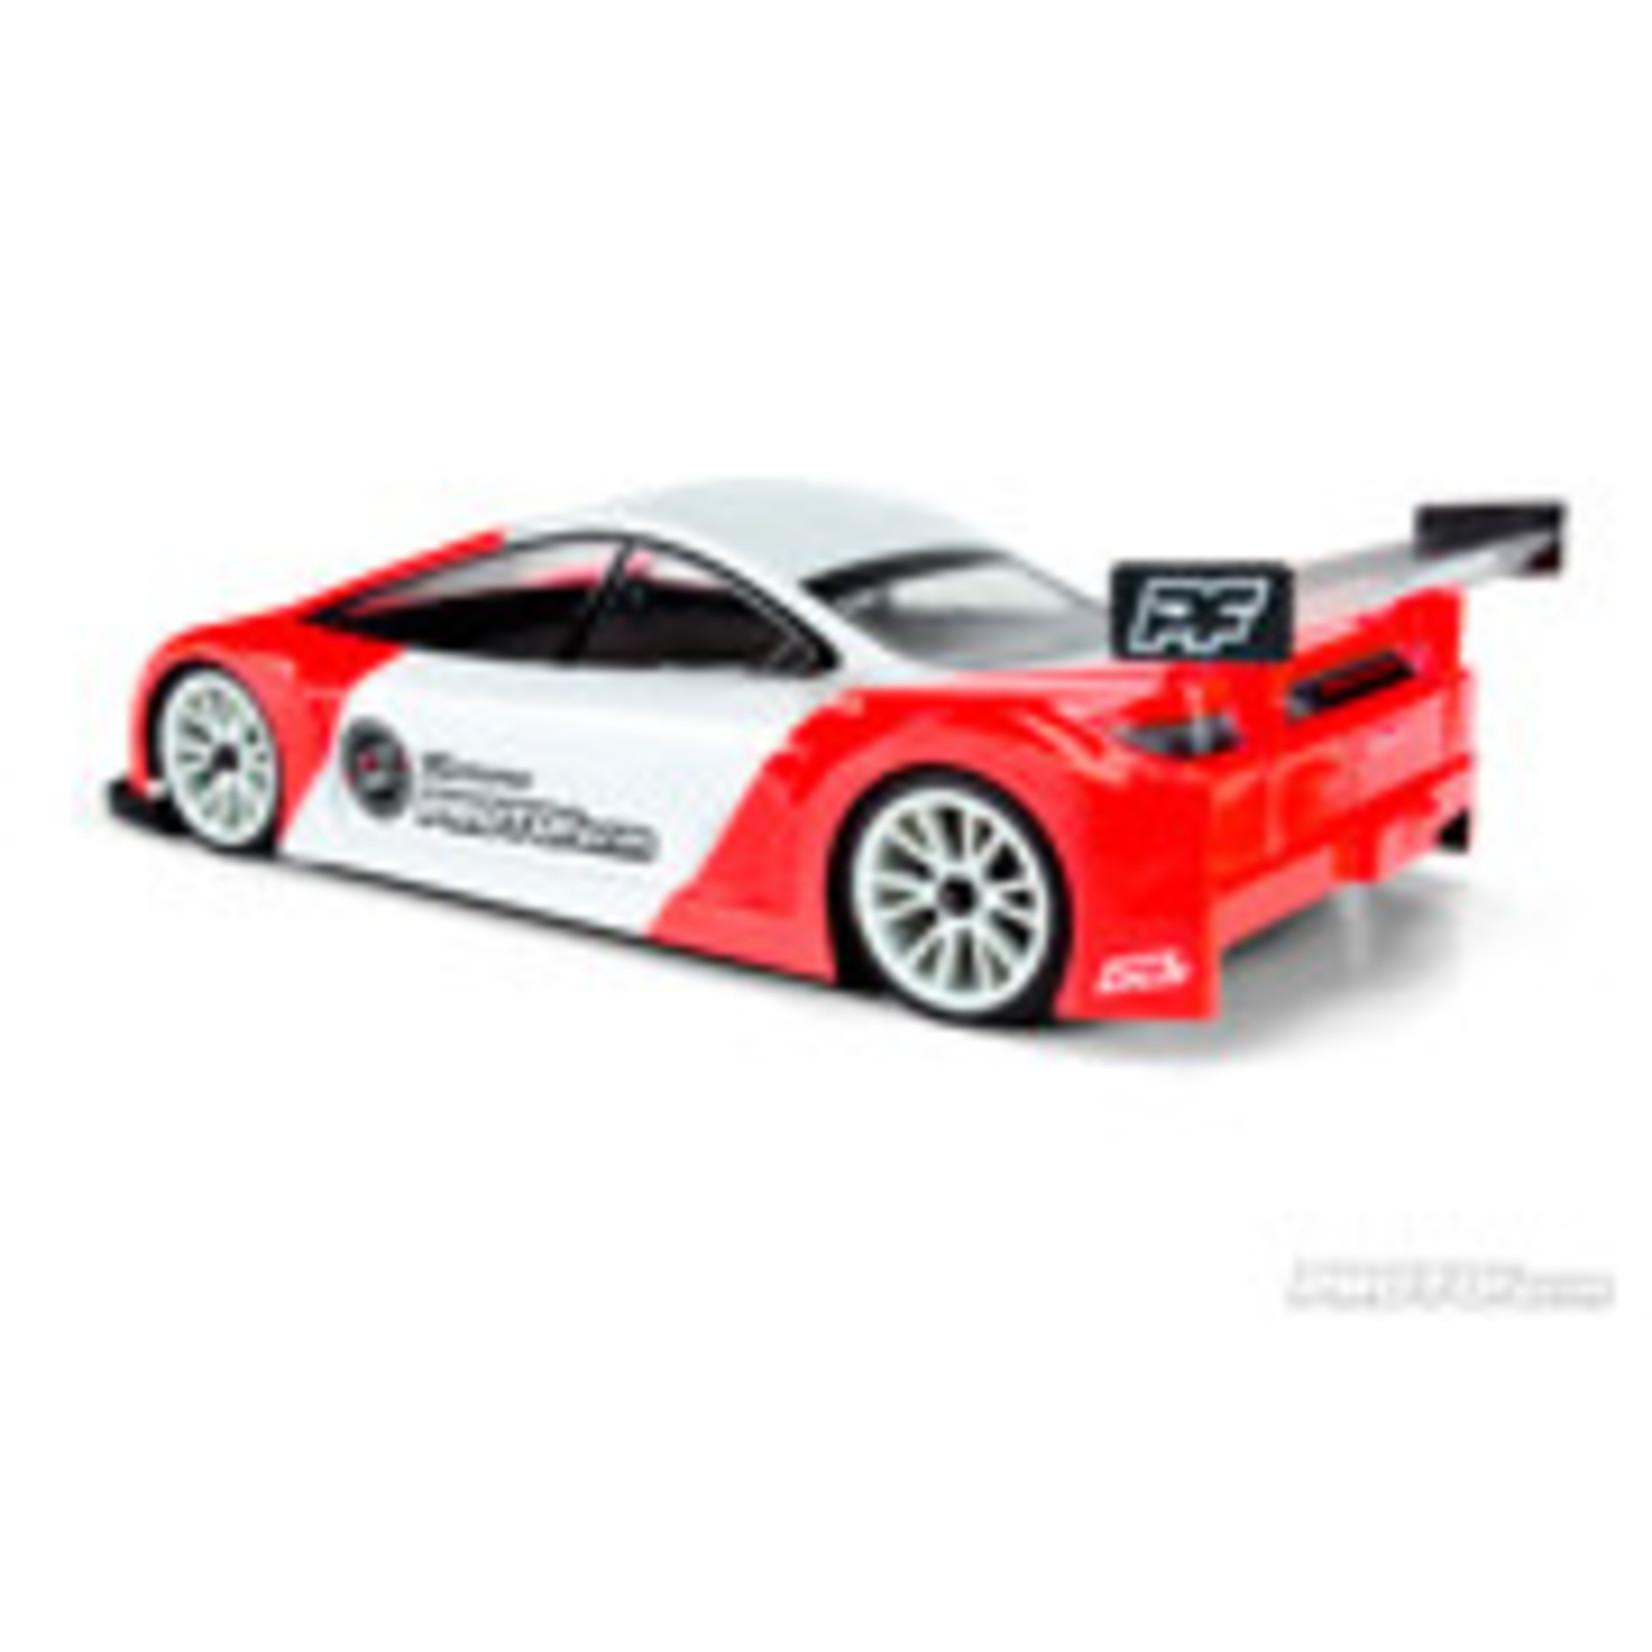 PROTOform Turismo Touring Car Body (Clear) (190mm) (X-Lite)